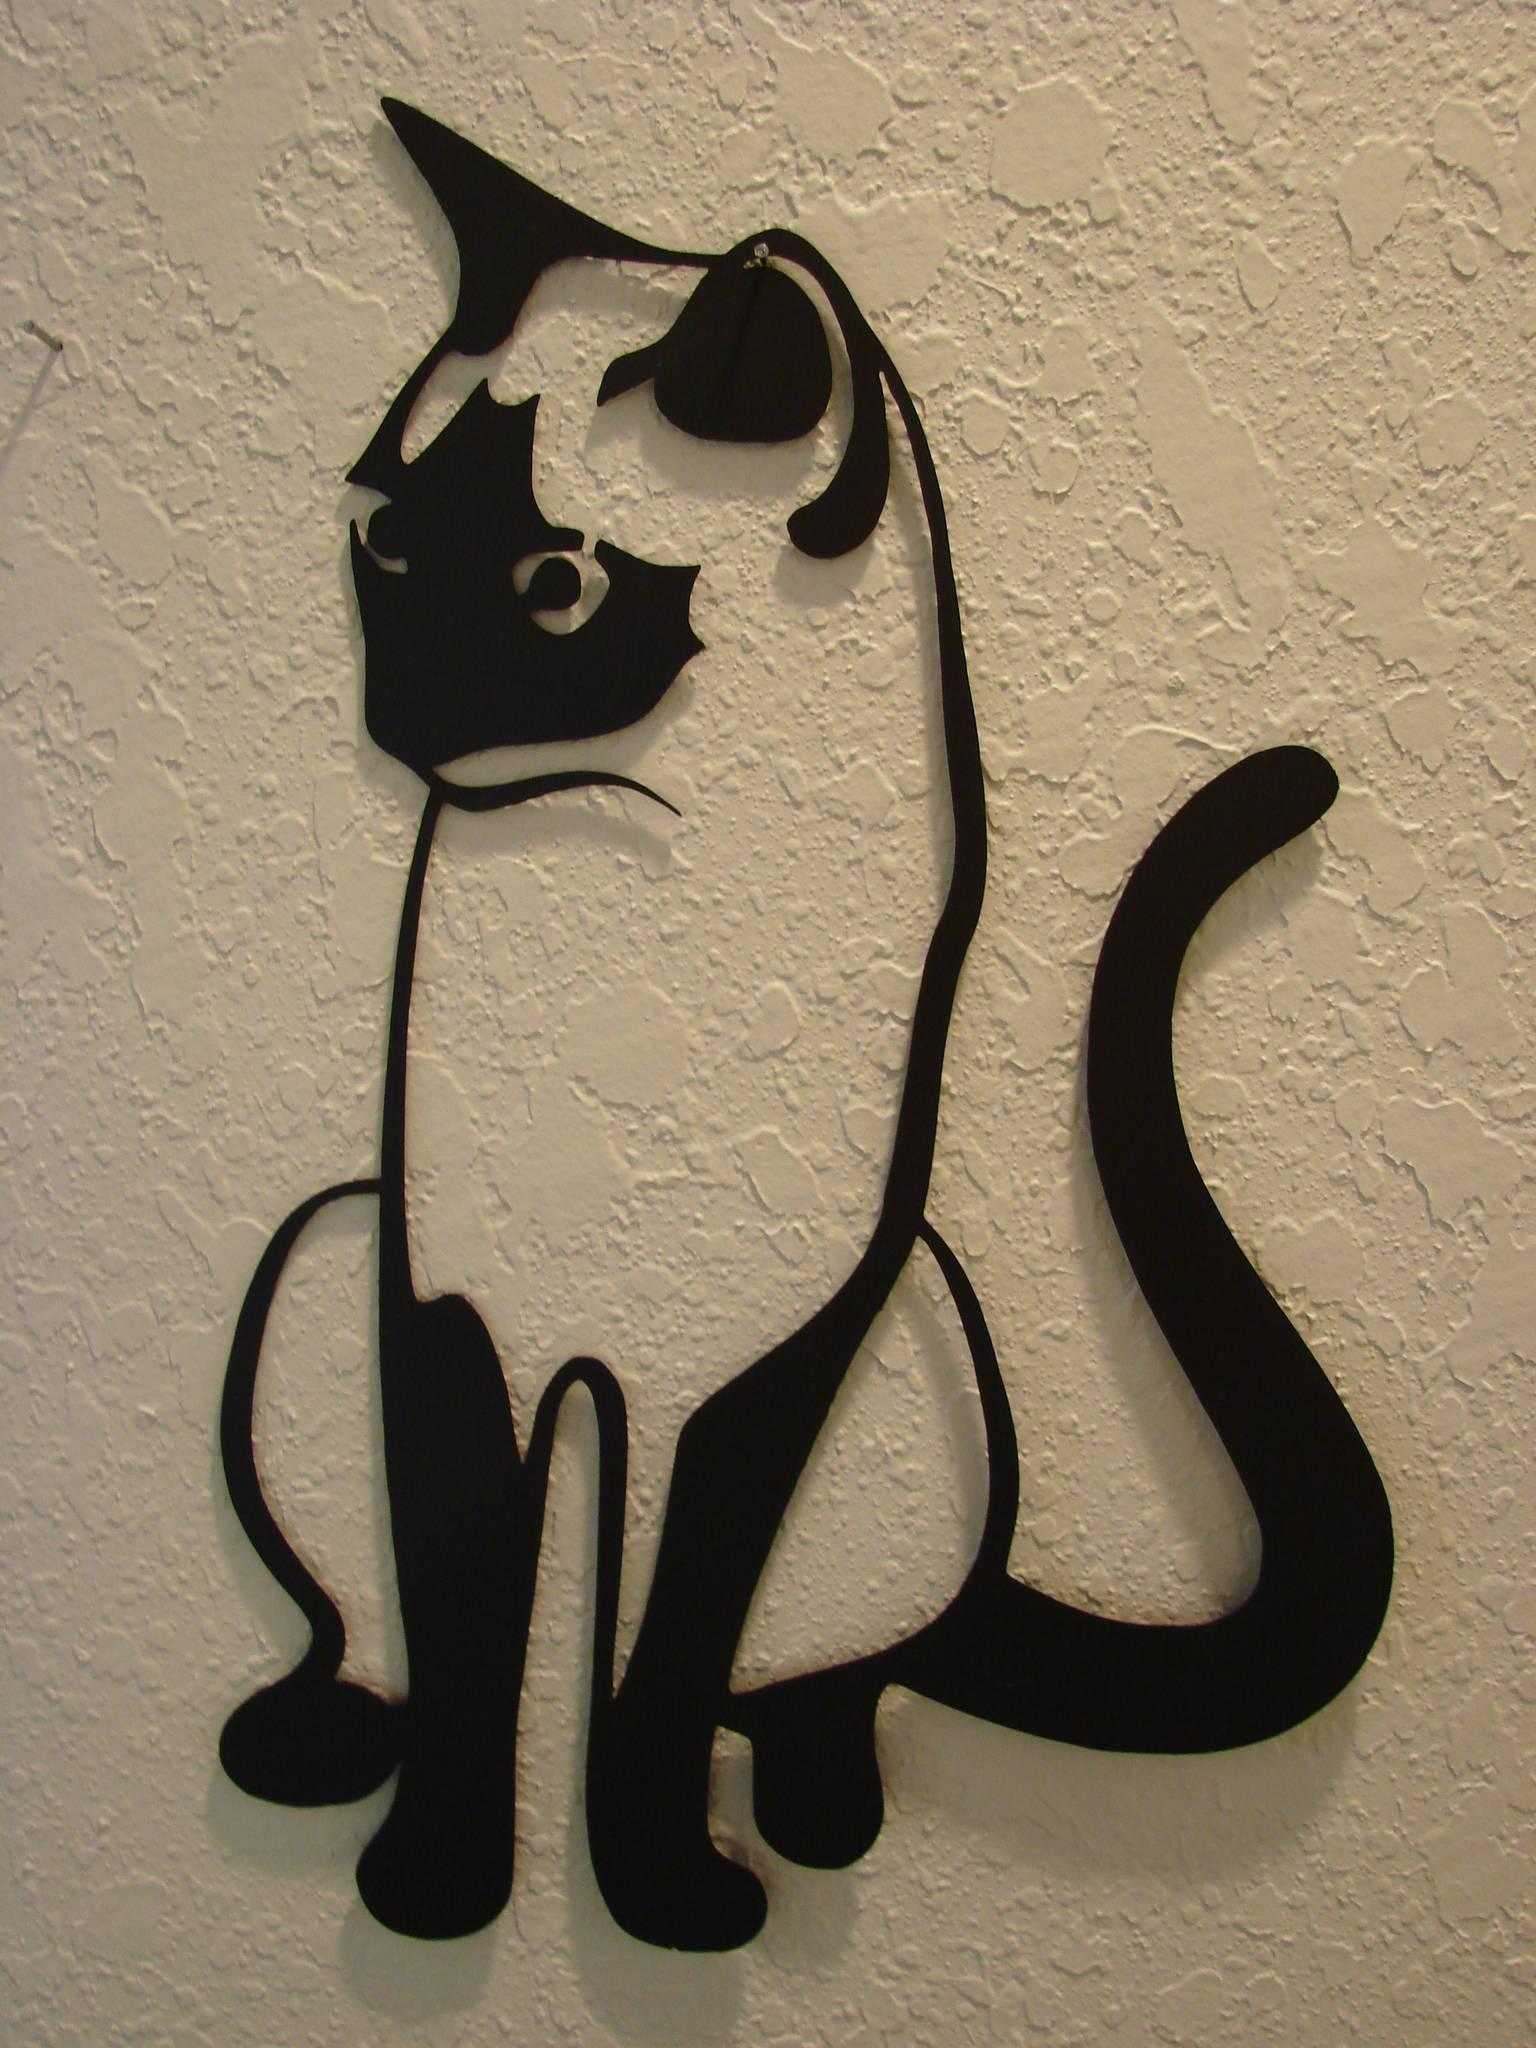 16 Gauge Plasma Cut Kitty Cat Metal Wall Art – : Inside Most Recent Plasma Cut Metal Wall Art (View 4 of 20)